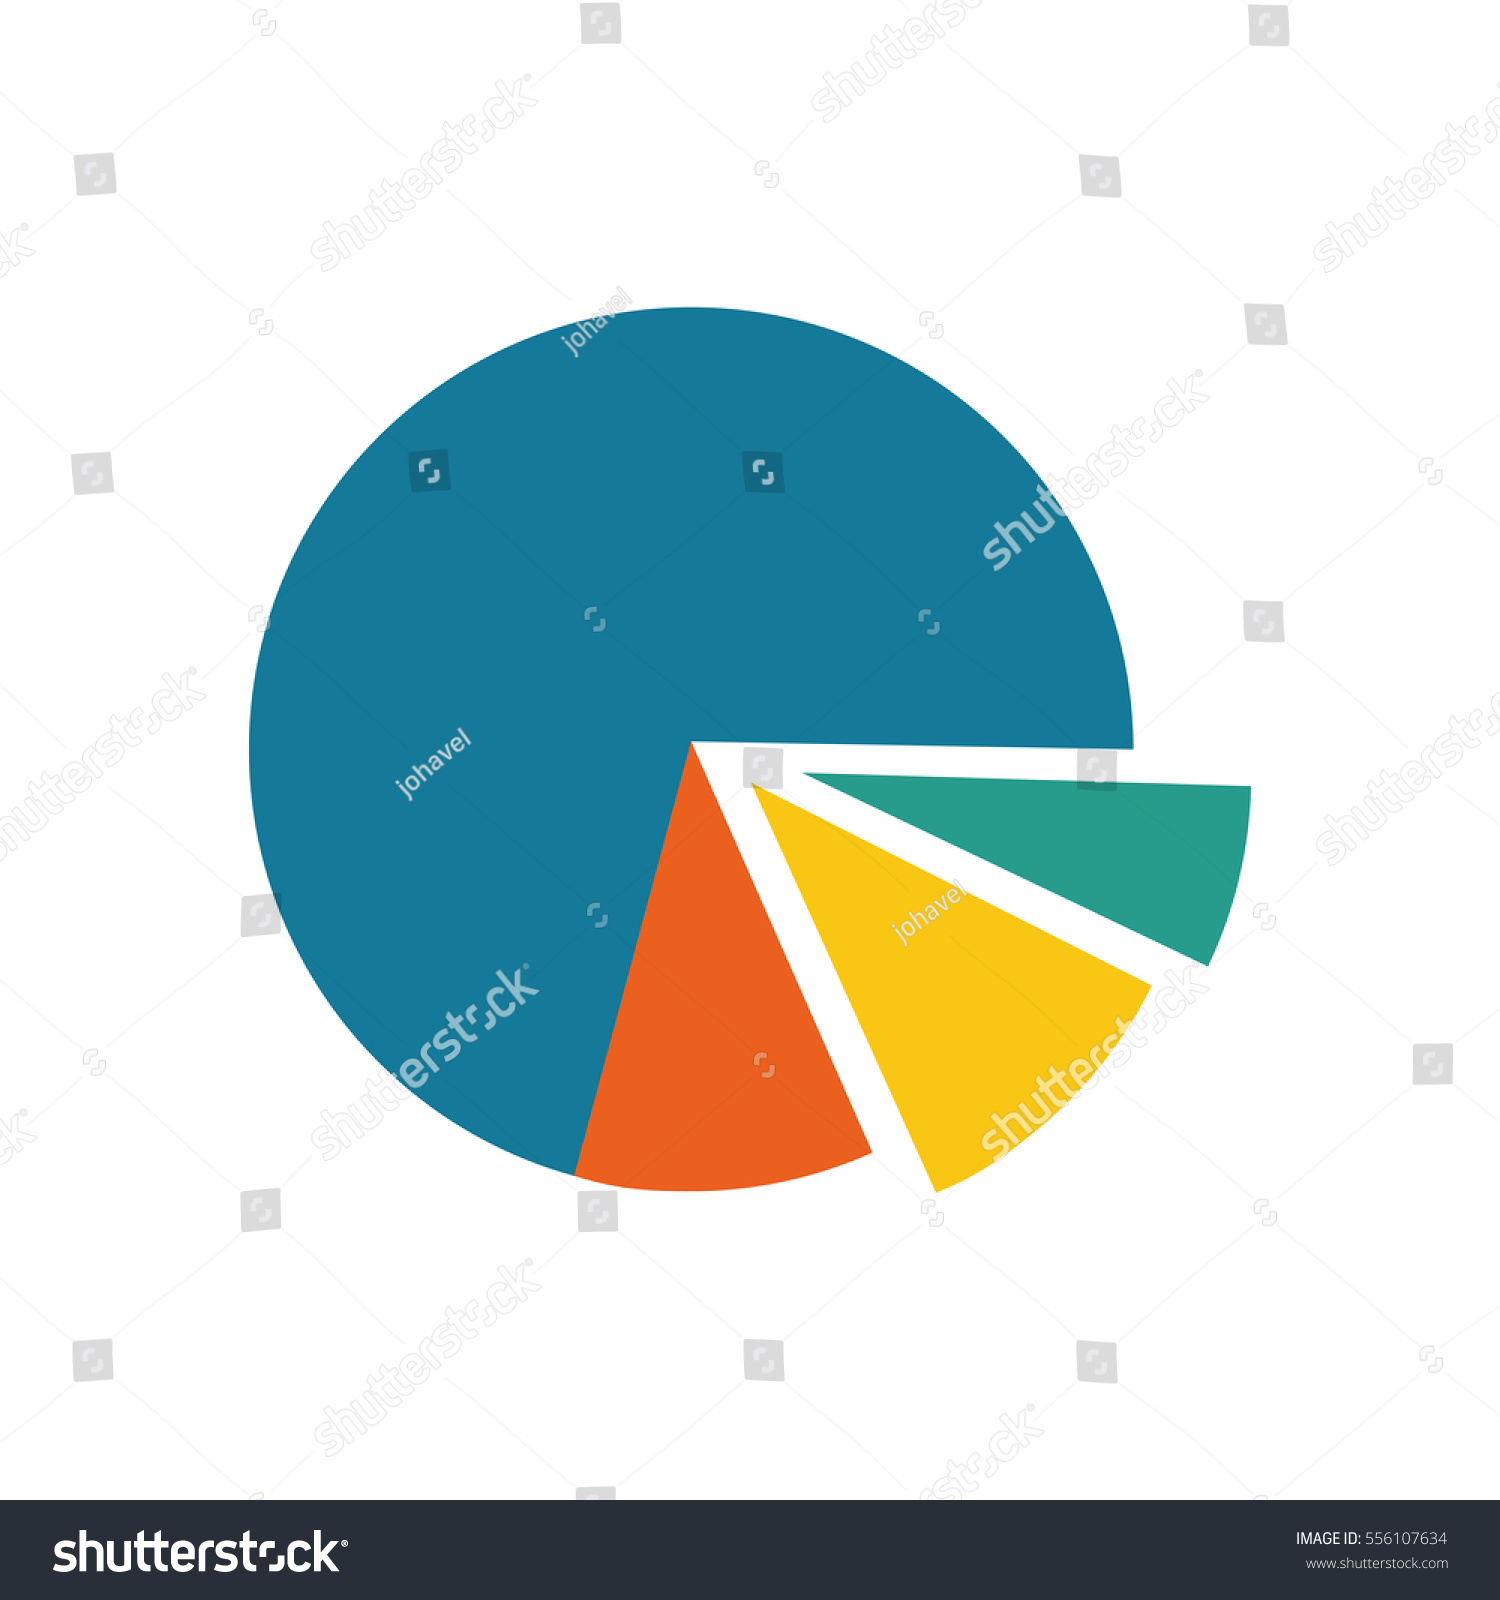 Statistics Pie Chart Icon Vector Illustration Stock Vector Royalty